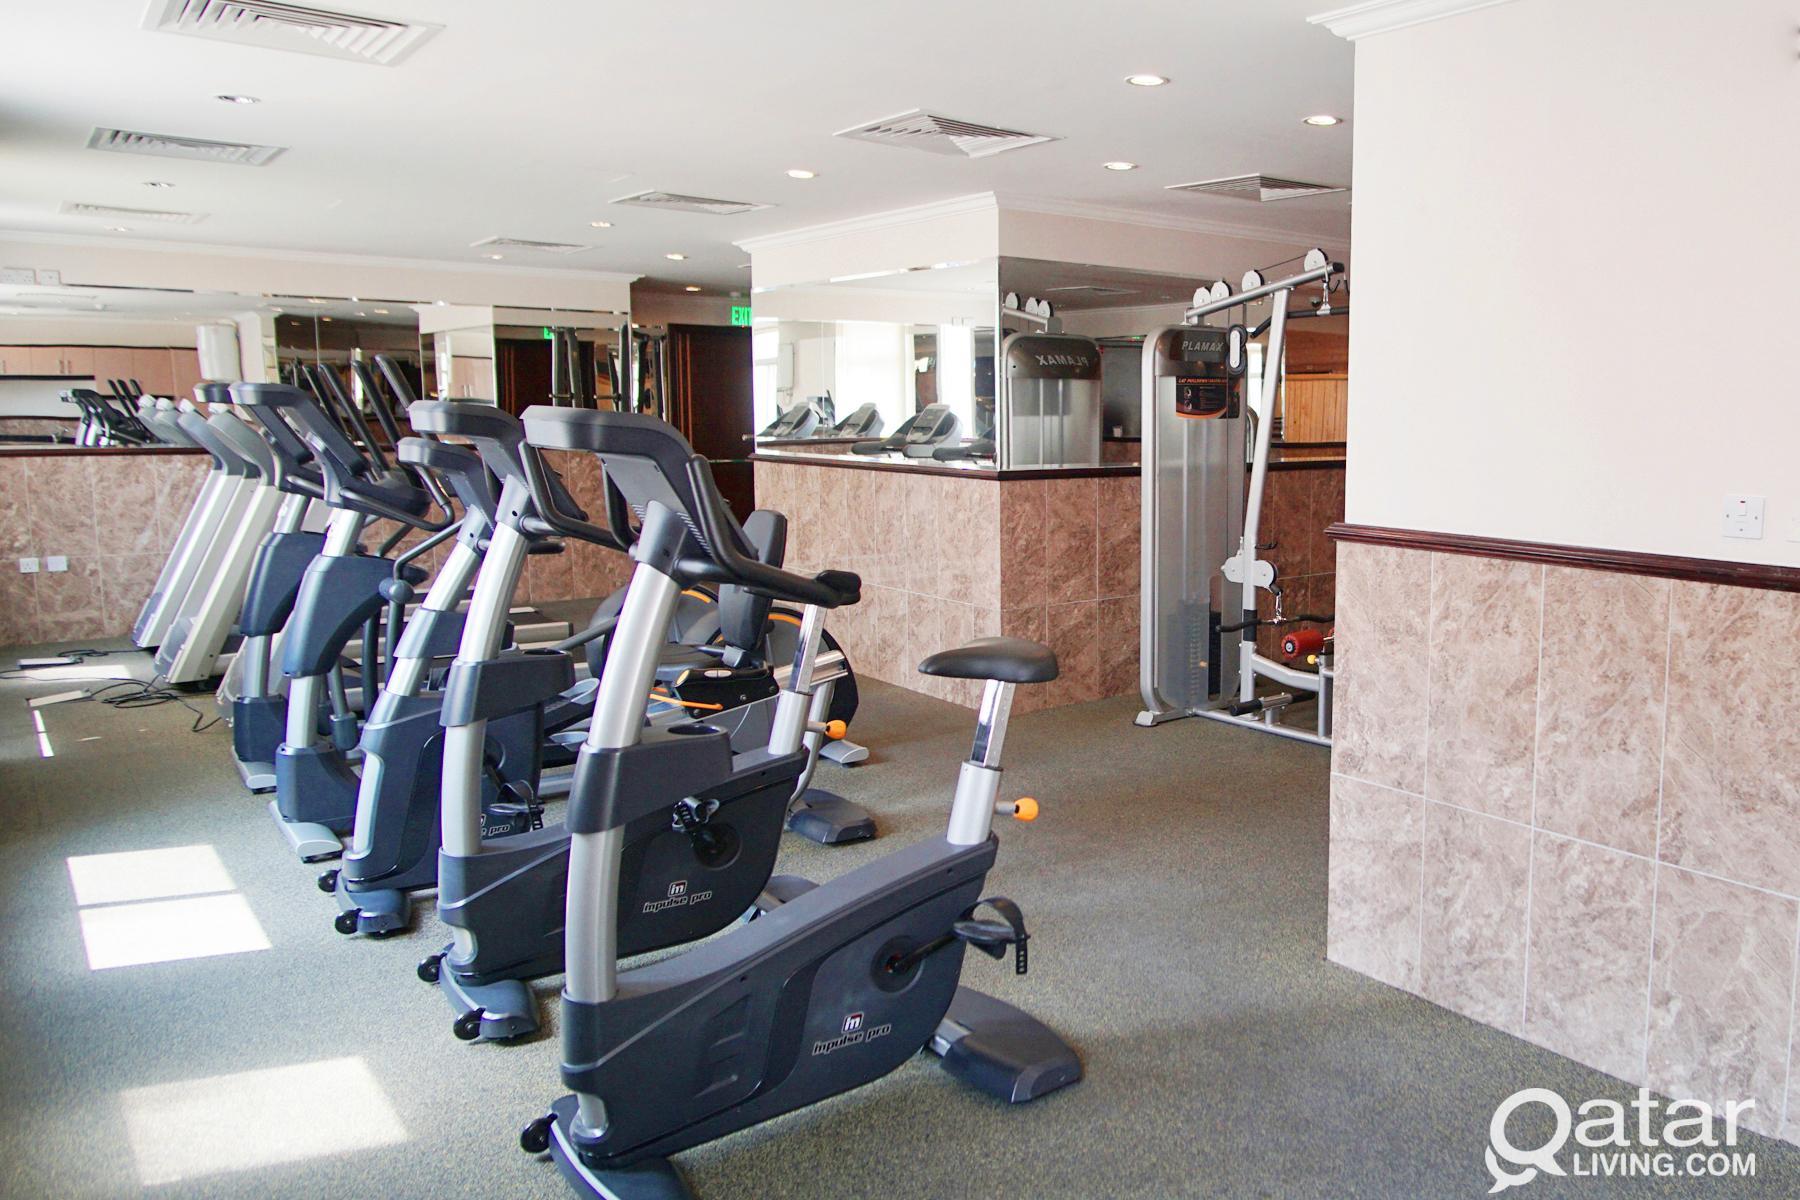 FF 1BHK w/ utilities (Gym, CCTV System, Sauna & St